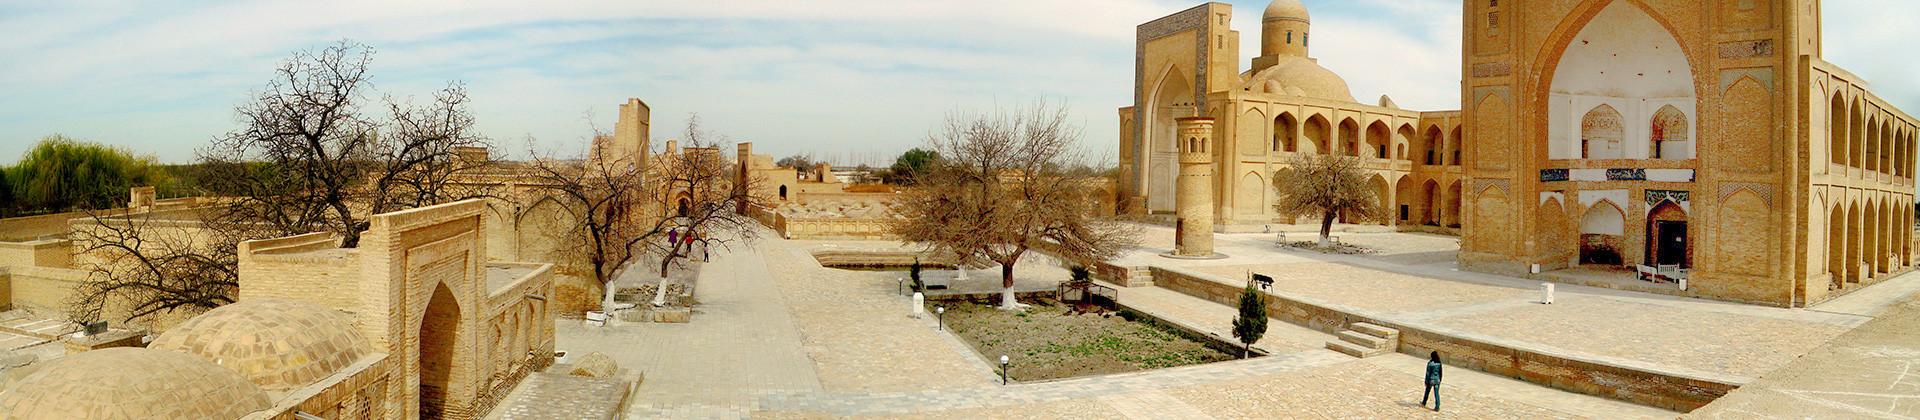 Классика Узбекистана - Ташкент, Хива, Бухара, Самарканд за 7 Дней (Премиум) - 1